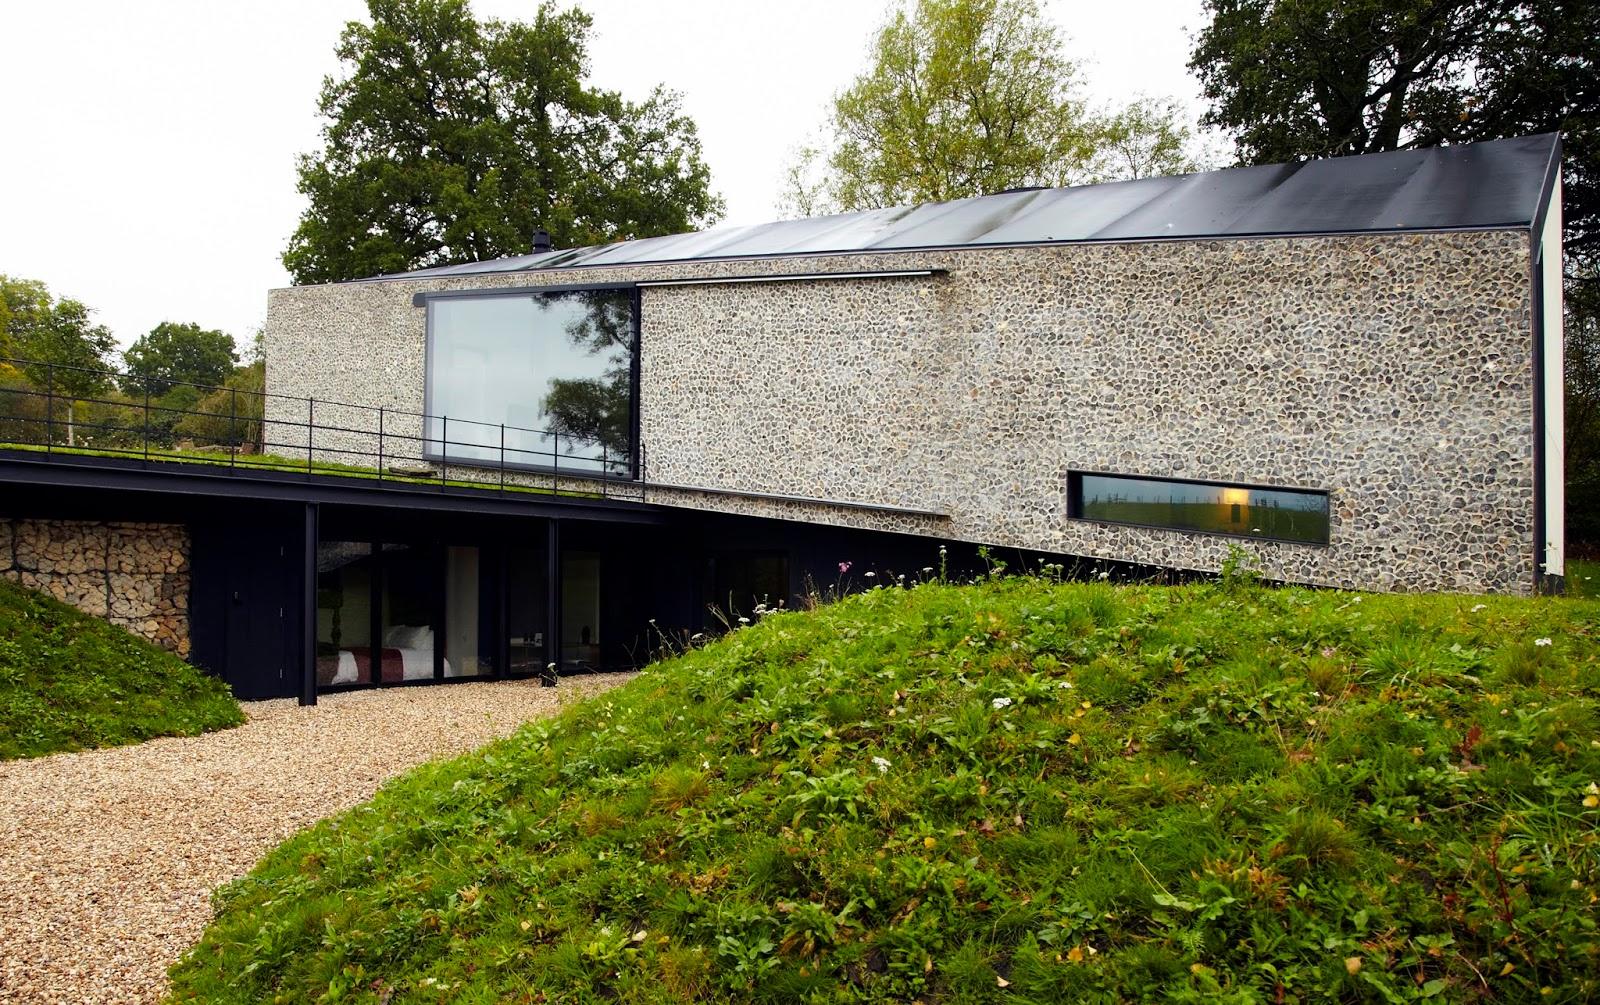 K 39 s drafts autumn tv draft k Home architecture newbury